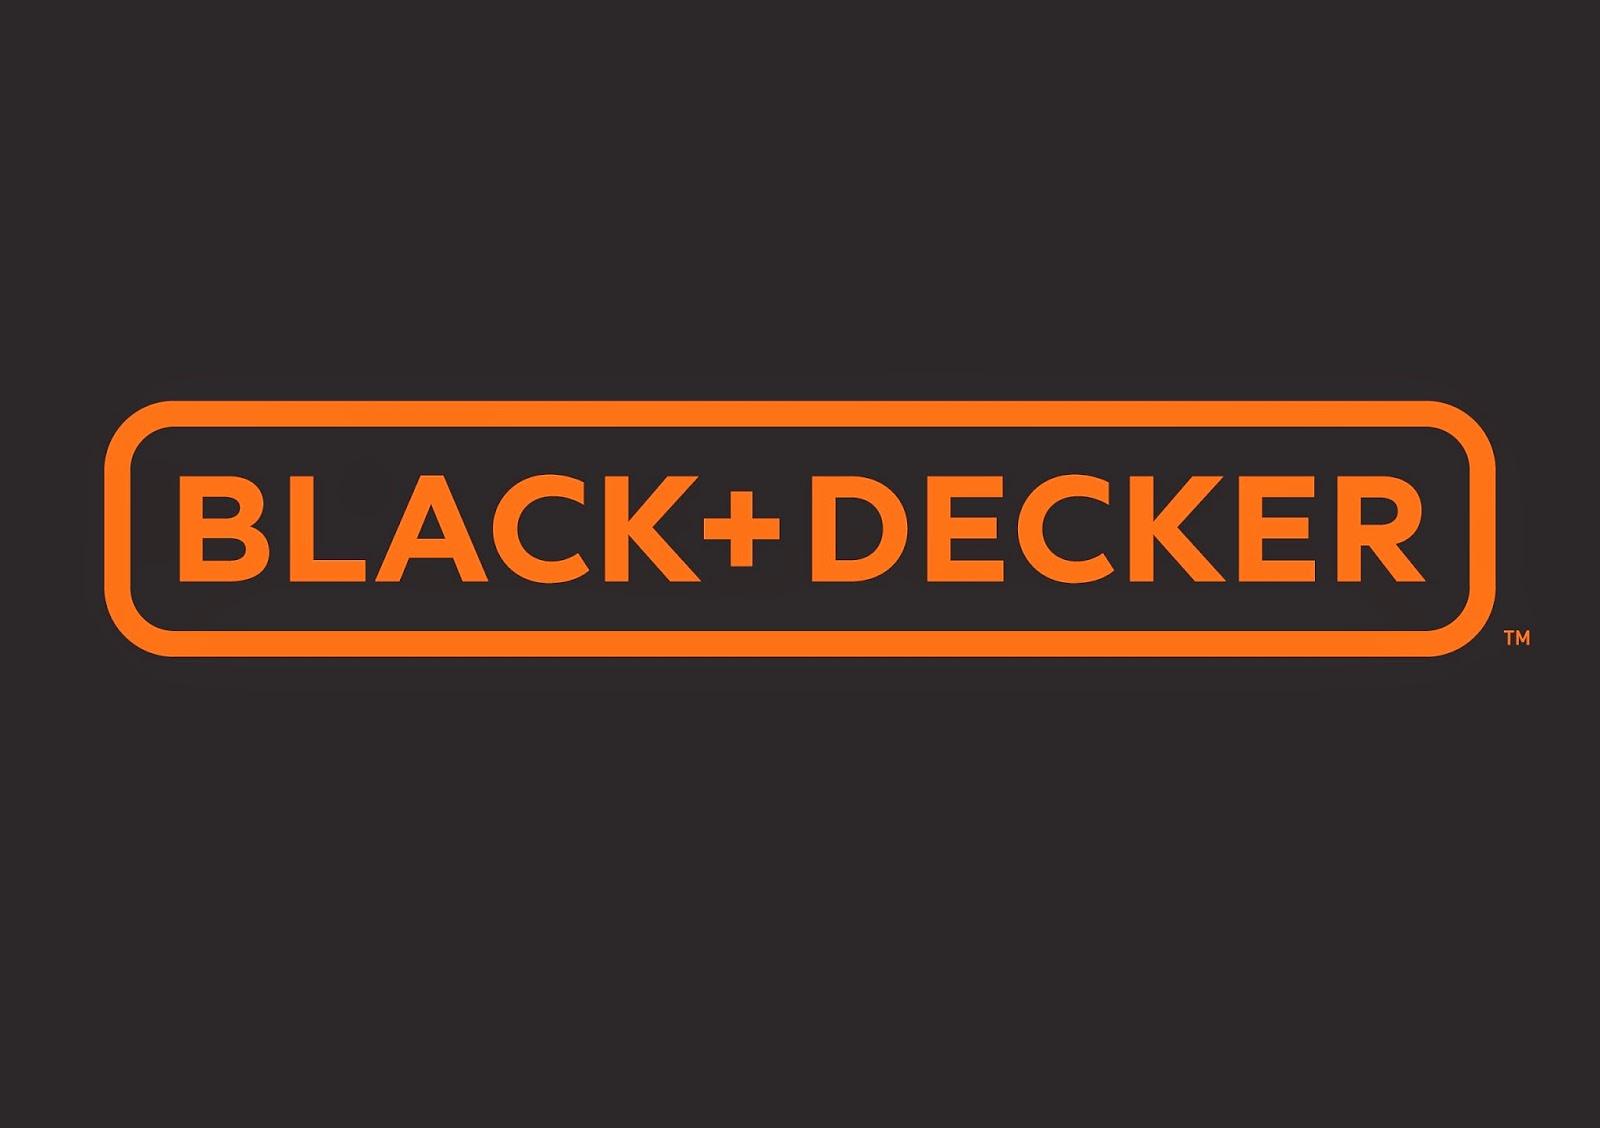 http://www.blackanddecker.es/mouse/